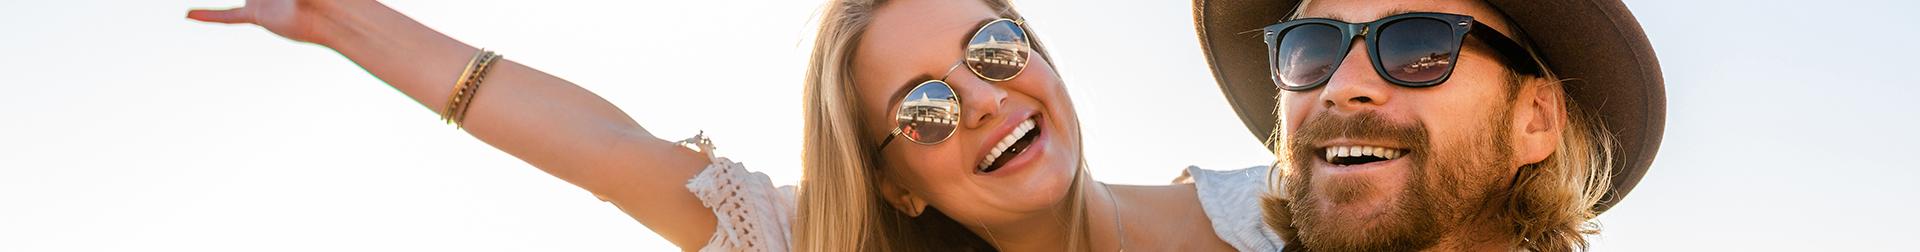 Sunglasses | Sunglasses - Buy Best Stylish Sunglasses for Men And Women | AromaCraze